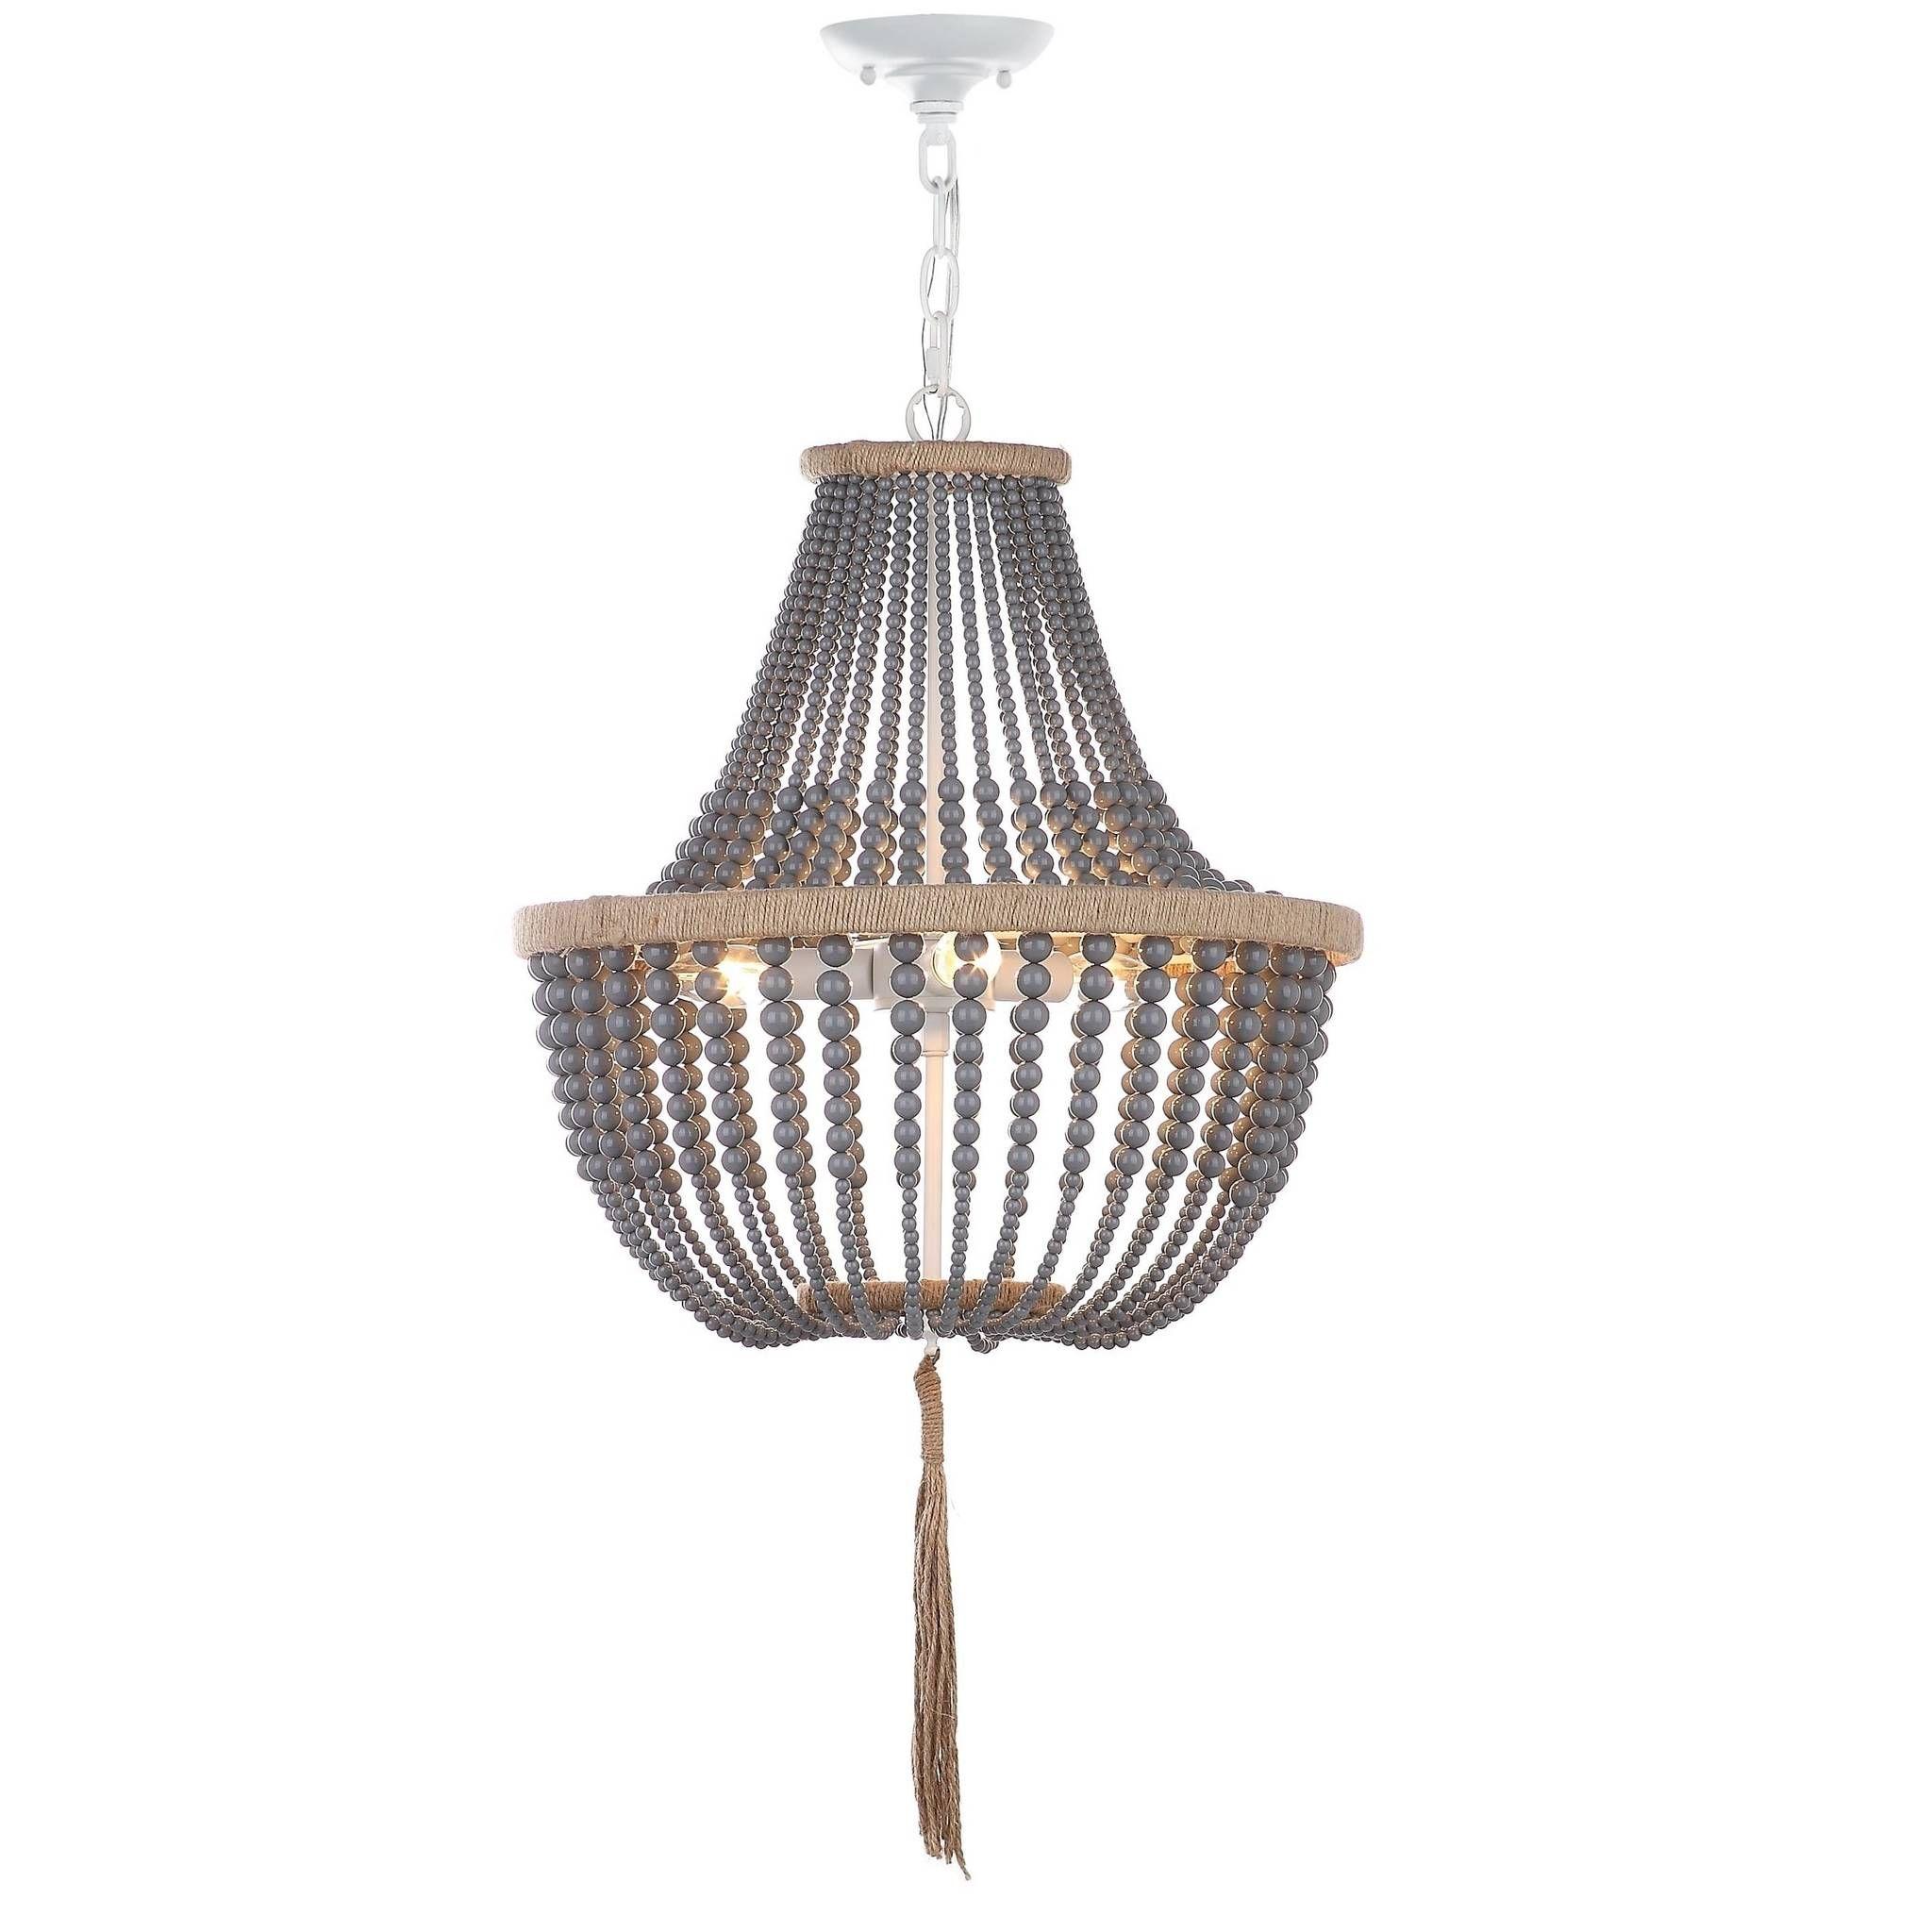 Adjustable 3 Light Bohemian Beaded Pendant Lamp